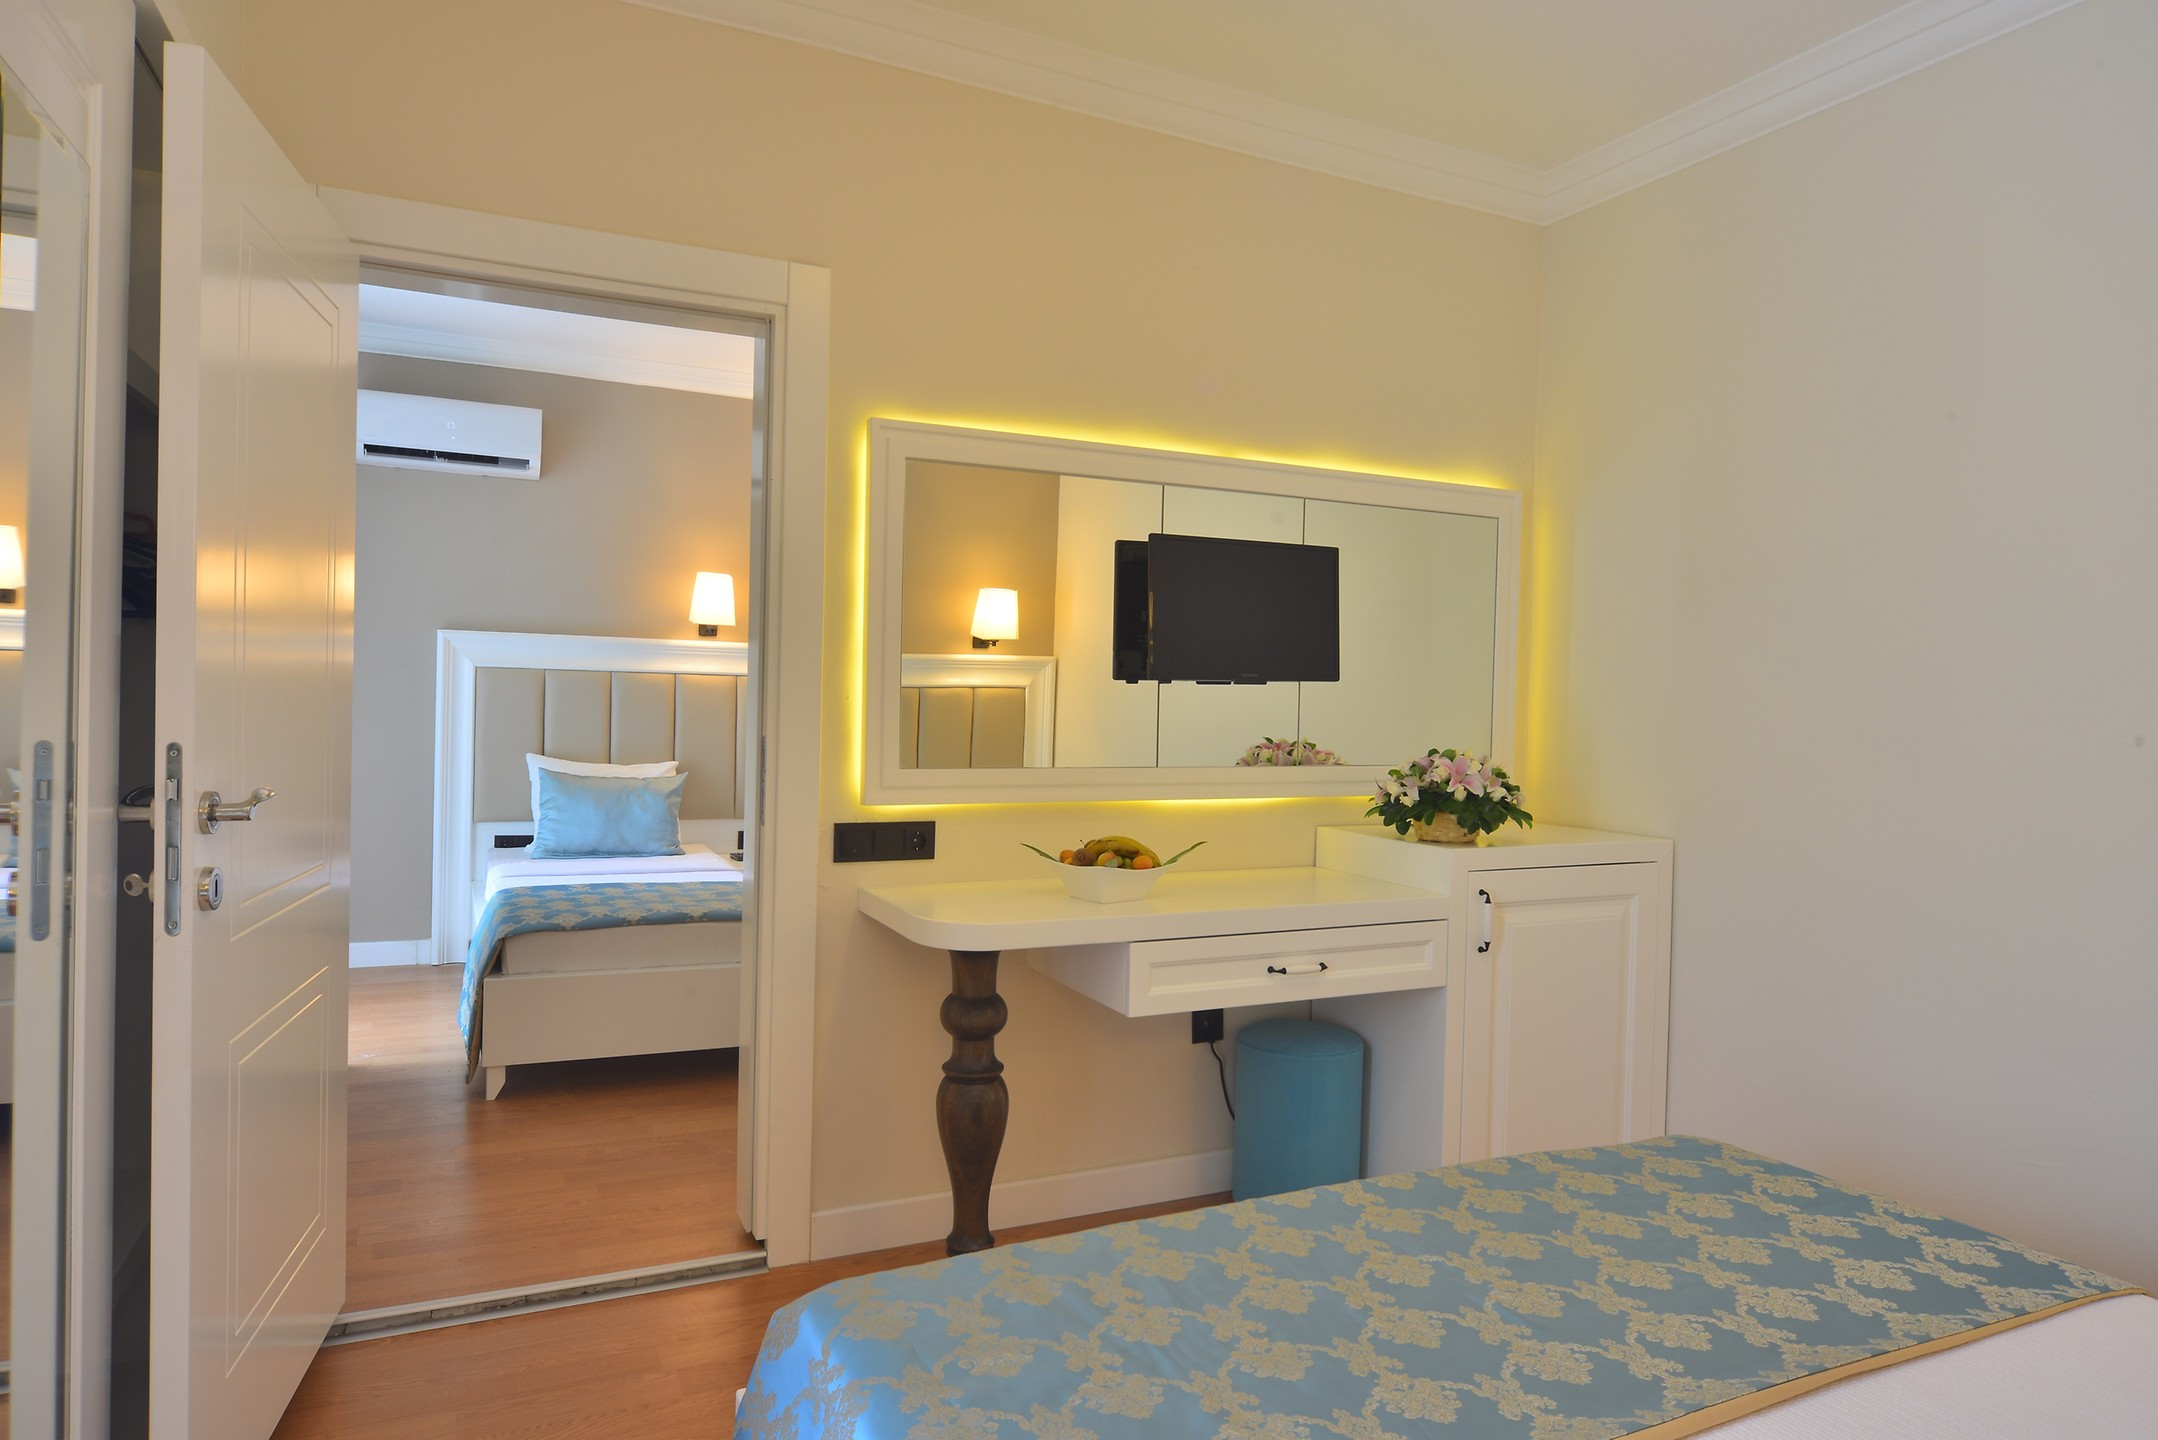 SEA STAR HOTEL261942